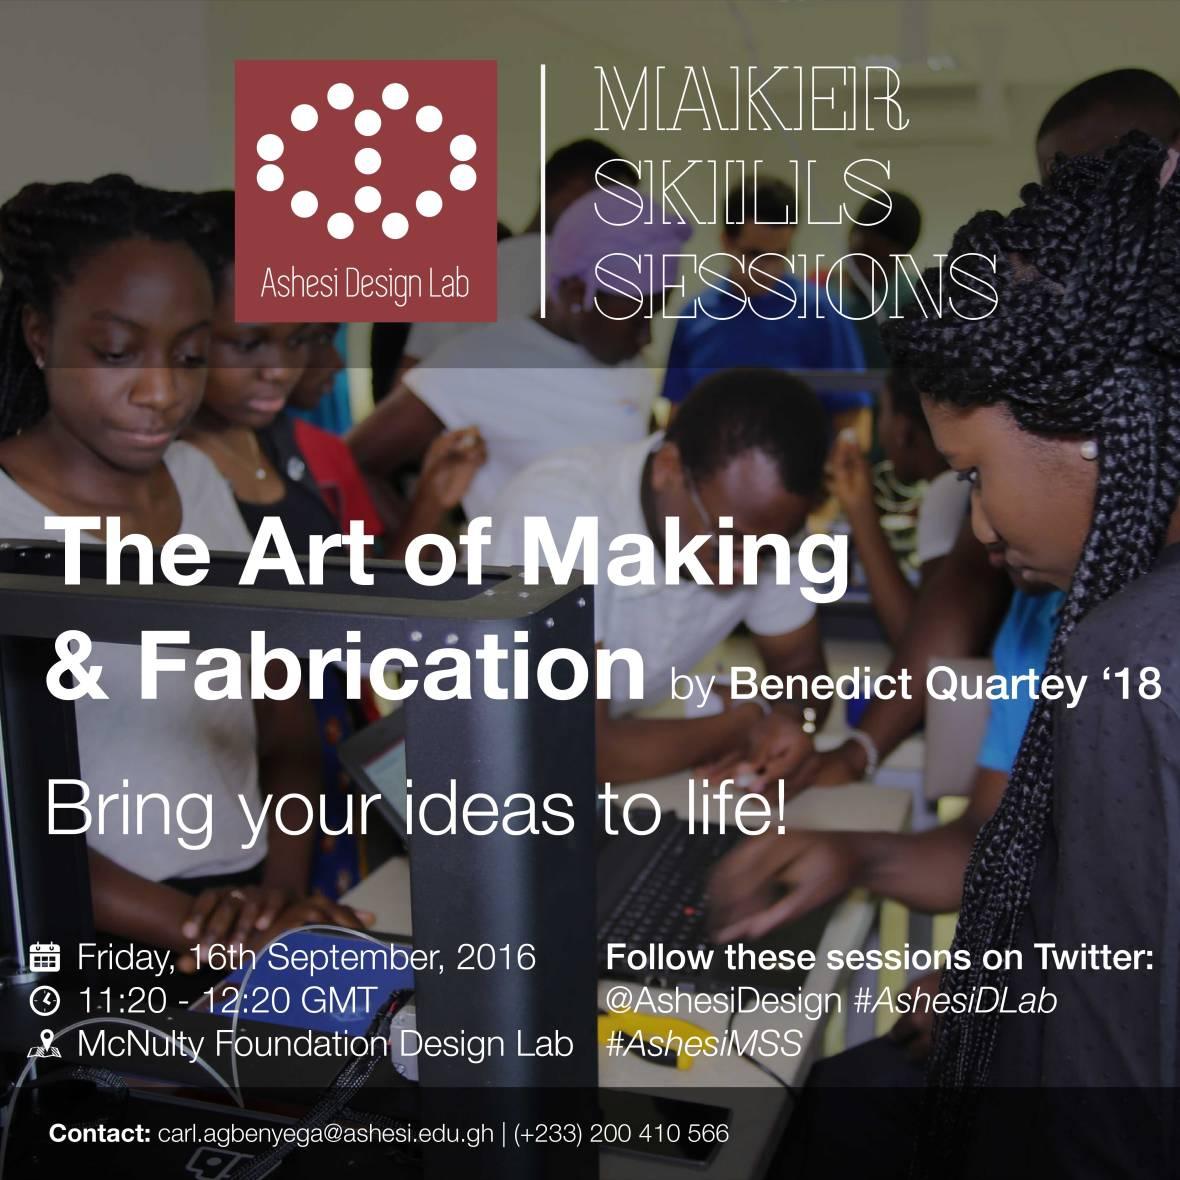 ashesi-dlab-maker-skills-sessions-01-01-01